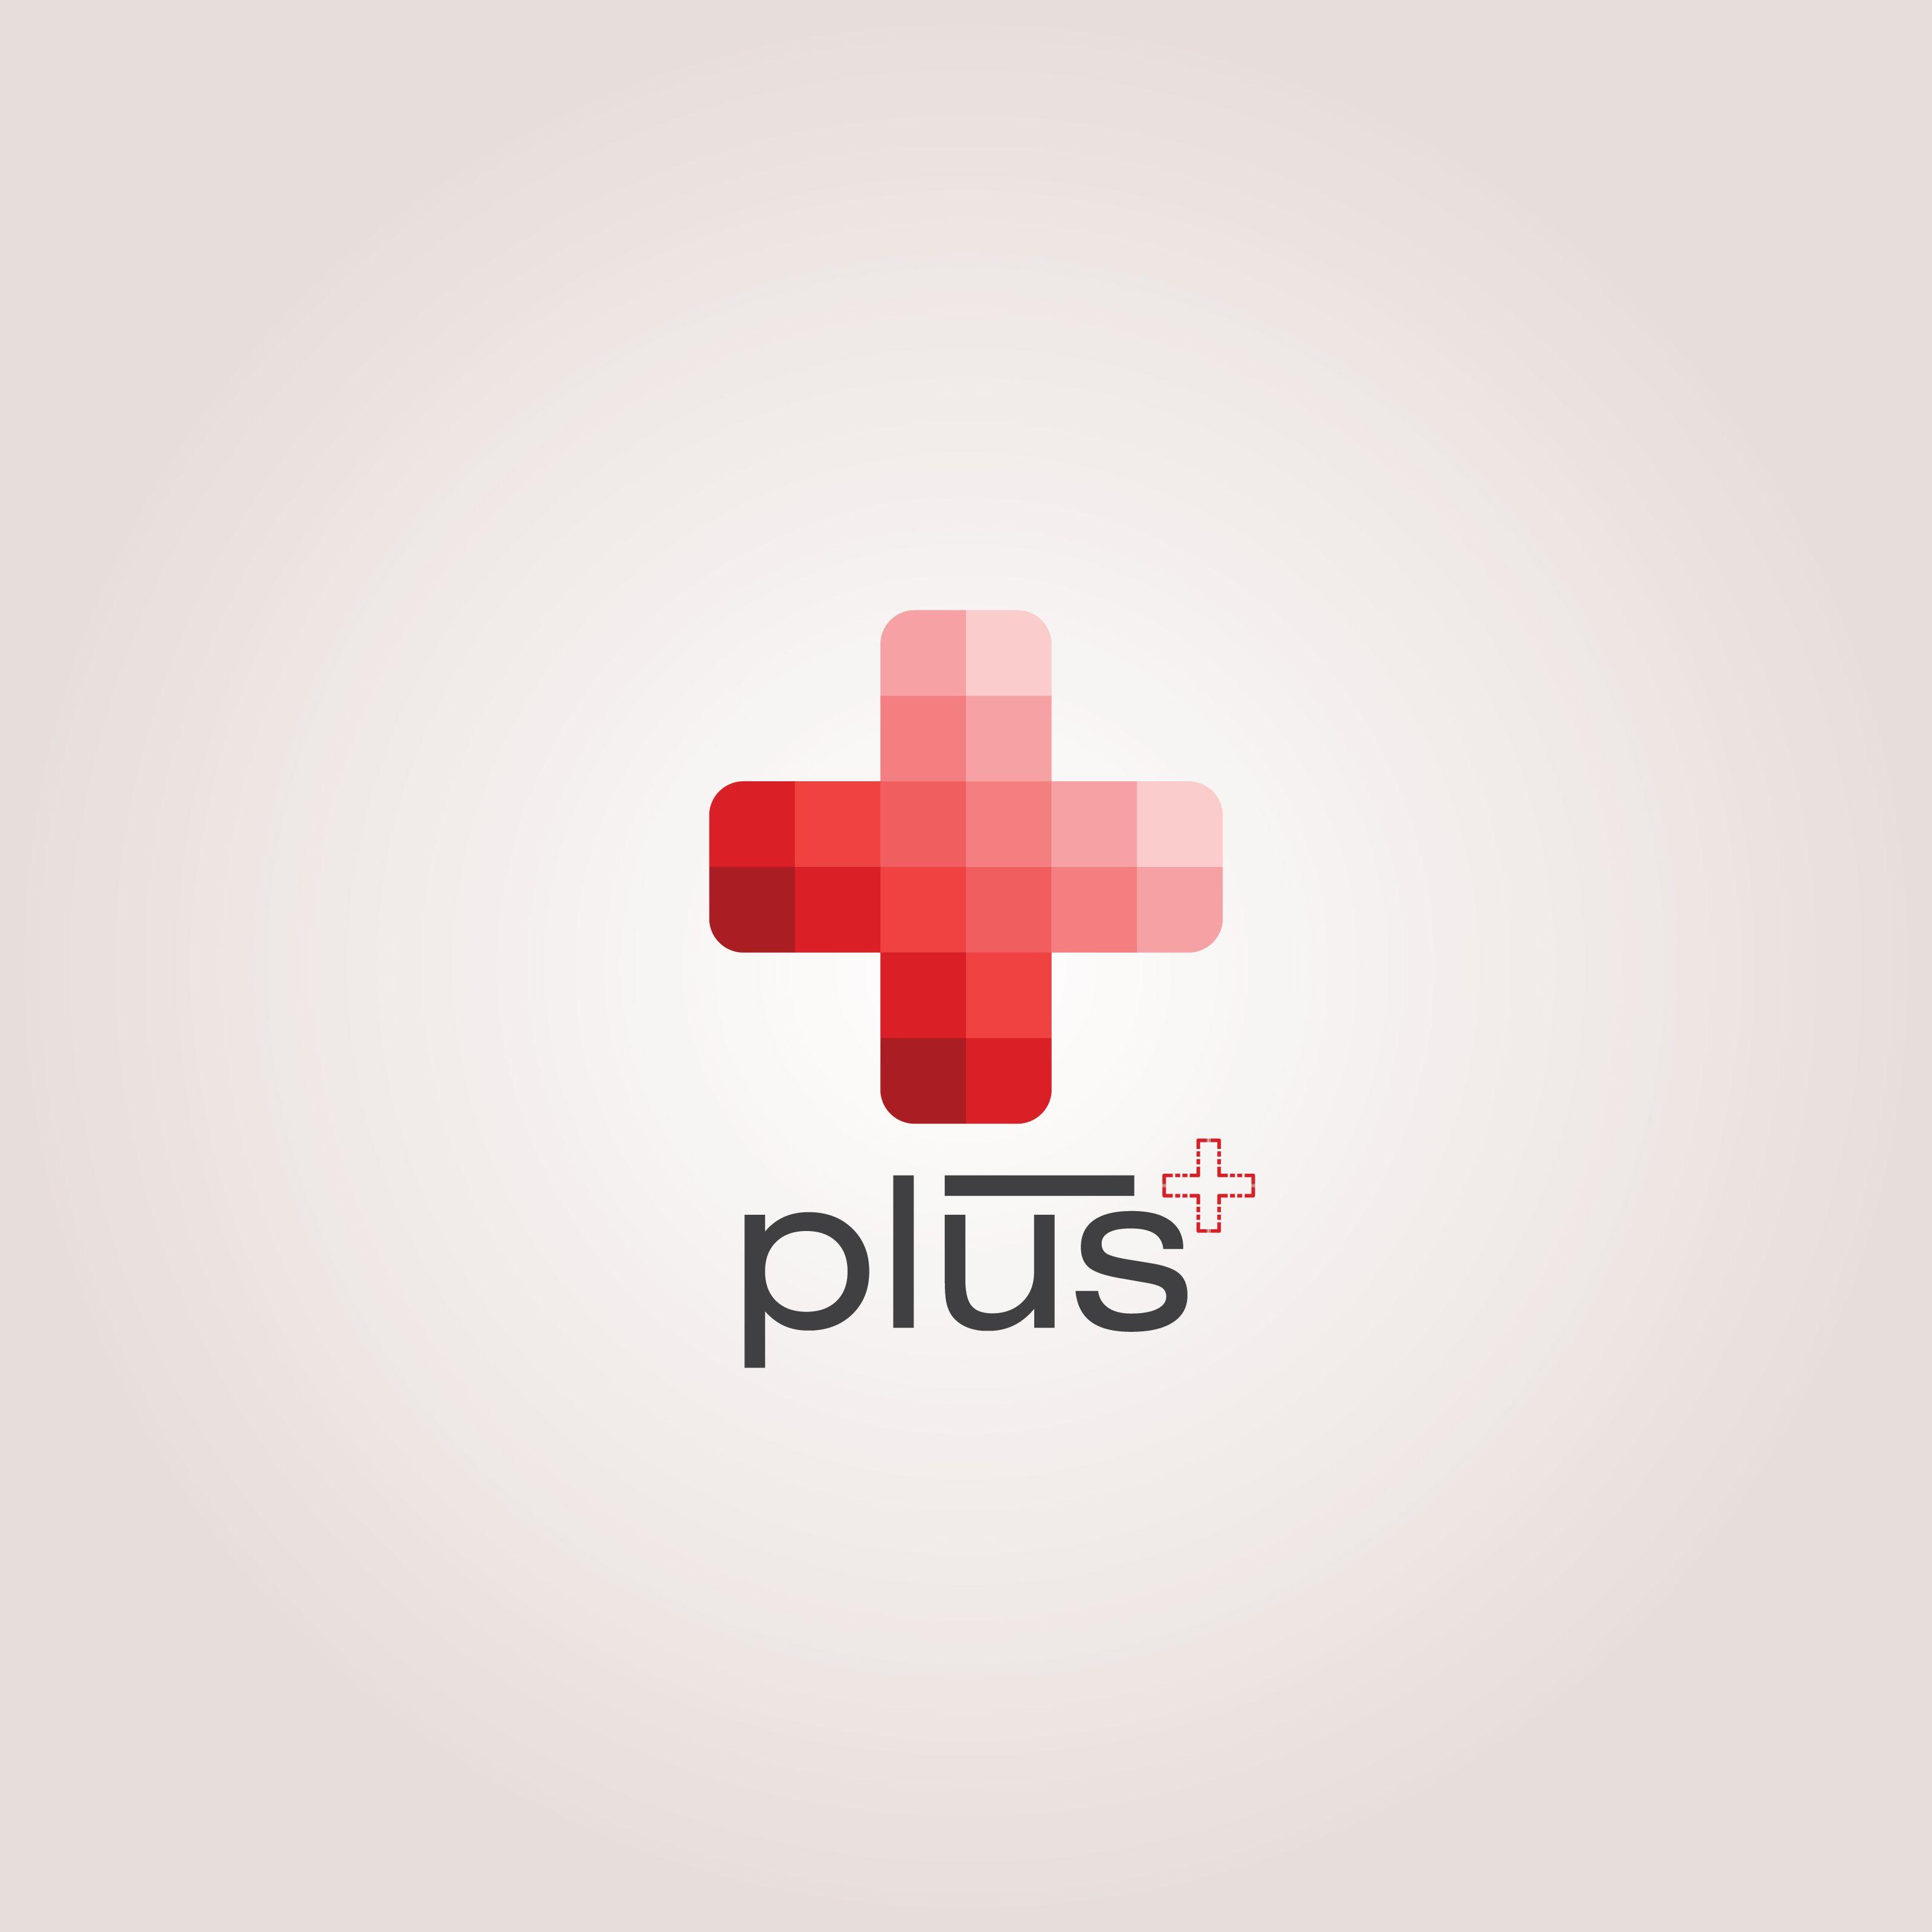 Red Monochromatic Color Plus Vector Logo Design Plus Eps Svg Dxf Jpg Png Red Cross Logo Logo Design Vector Logo